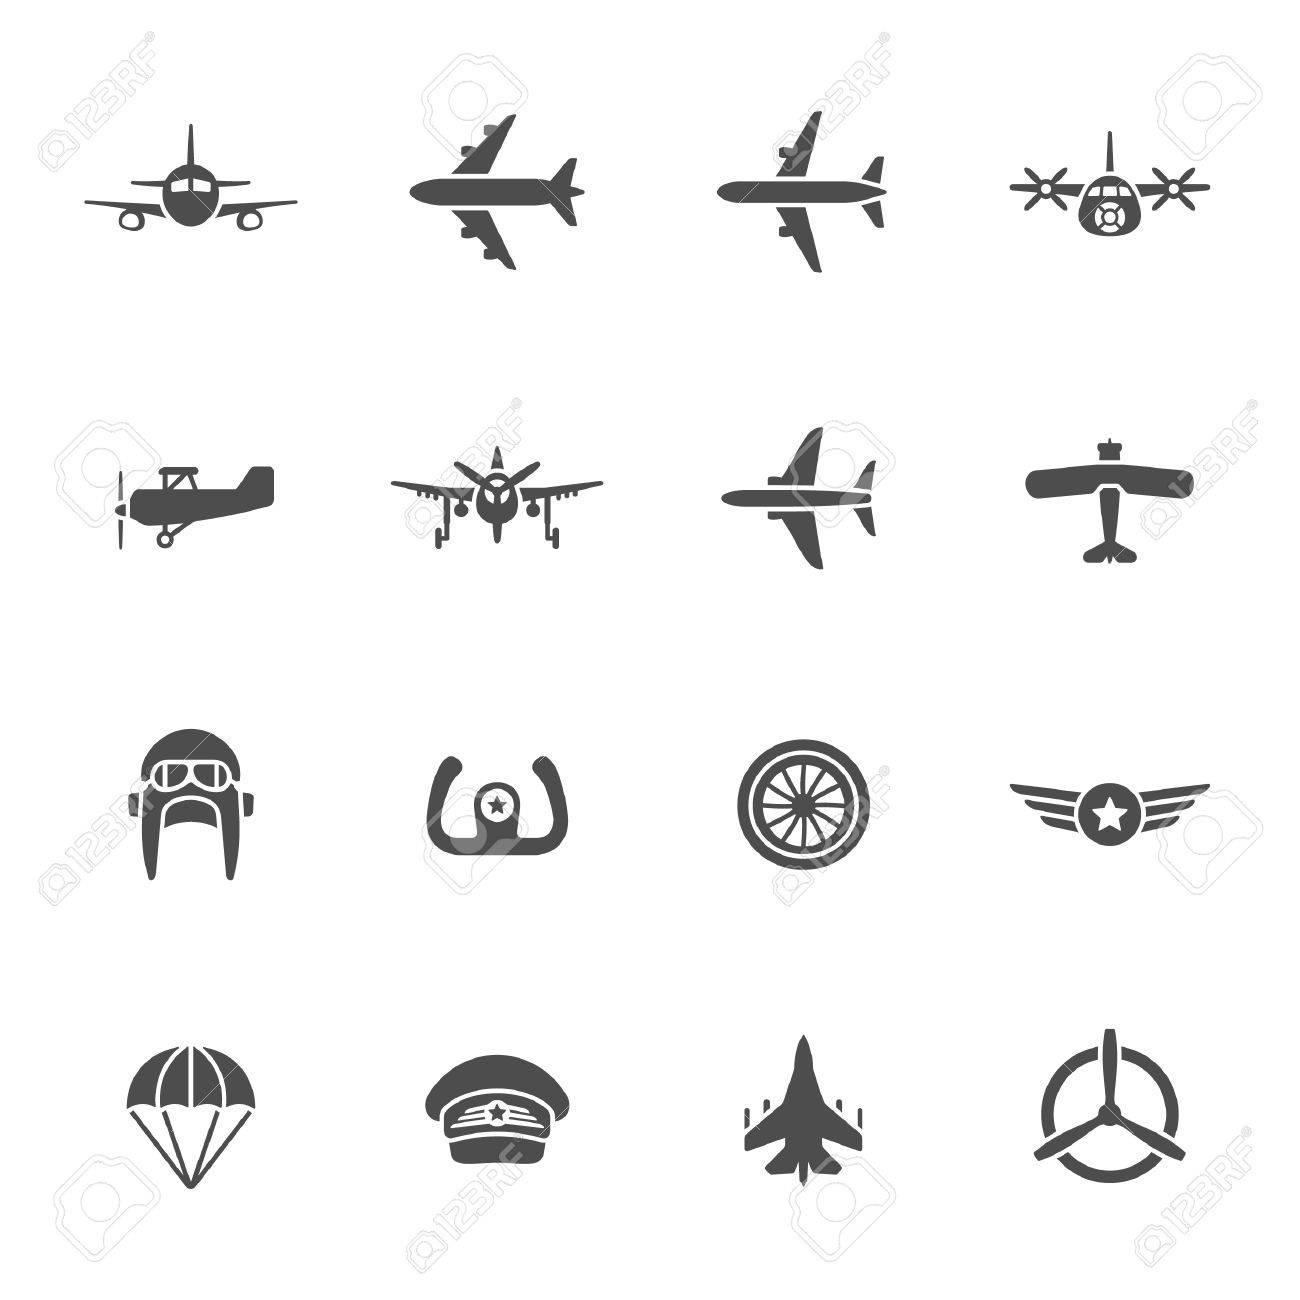 Aviation icon set - 40240416